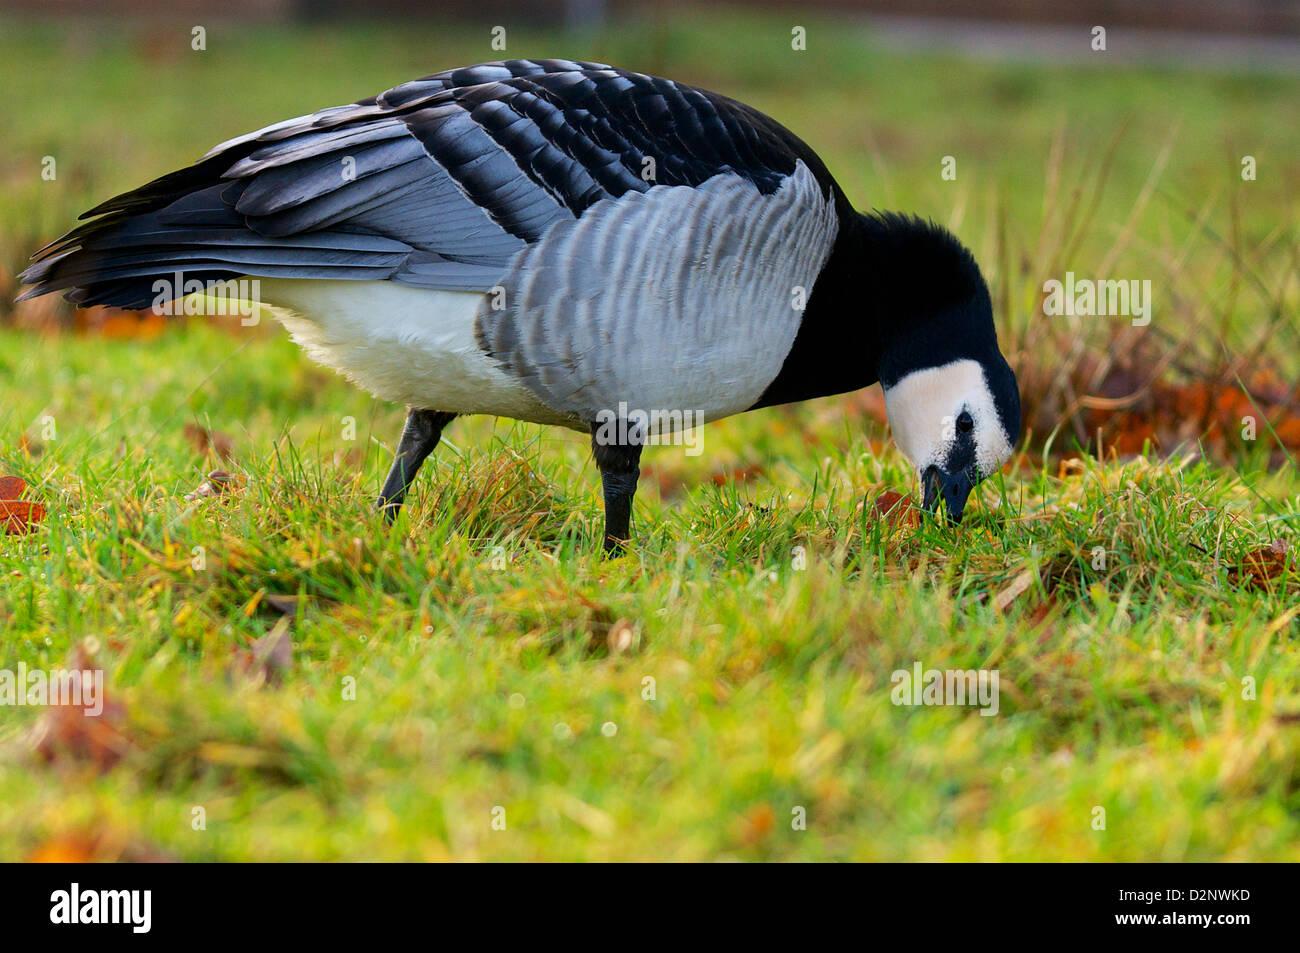 Barnacle Goose grazing in a meadow, Weisswangengans weidend. - Stock Image